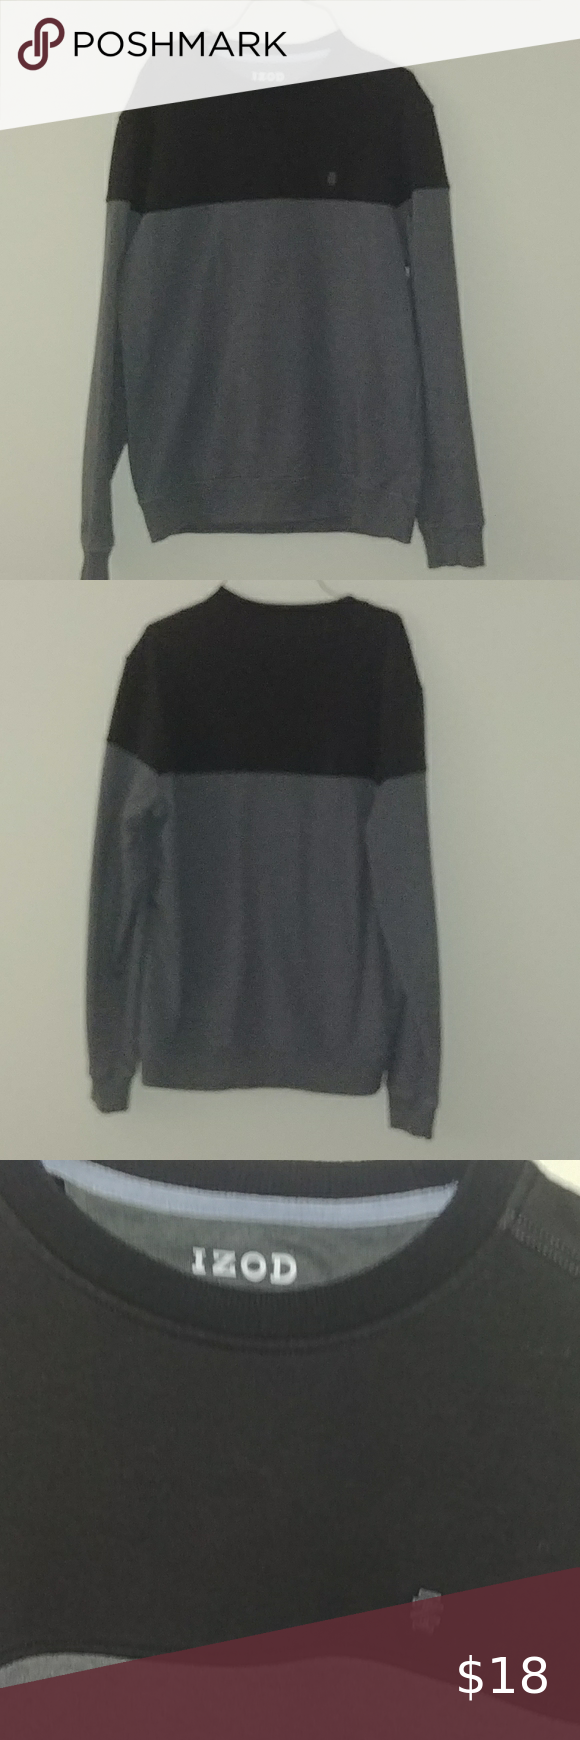 Izod Crewneck S Crewneck Sweatshirt Barely Worn Good Shape Performance Style Izod Sweaters Crewneck Clothes Design Sweaters Crewneck Izod Sweaters [ 1740 x 580 Pixel ]